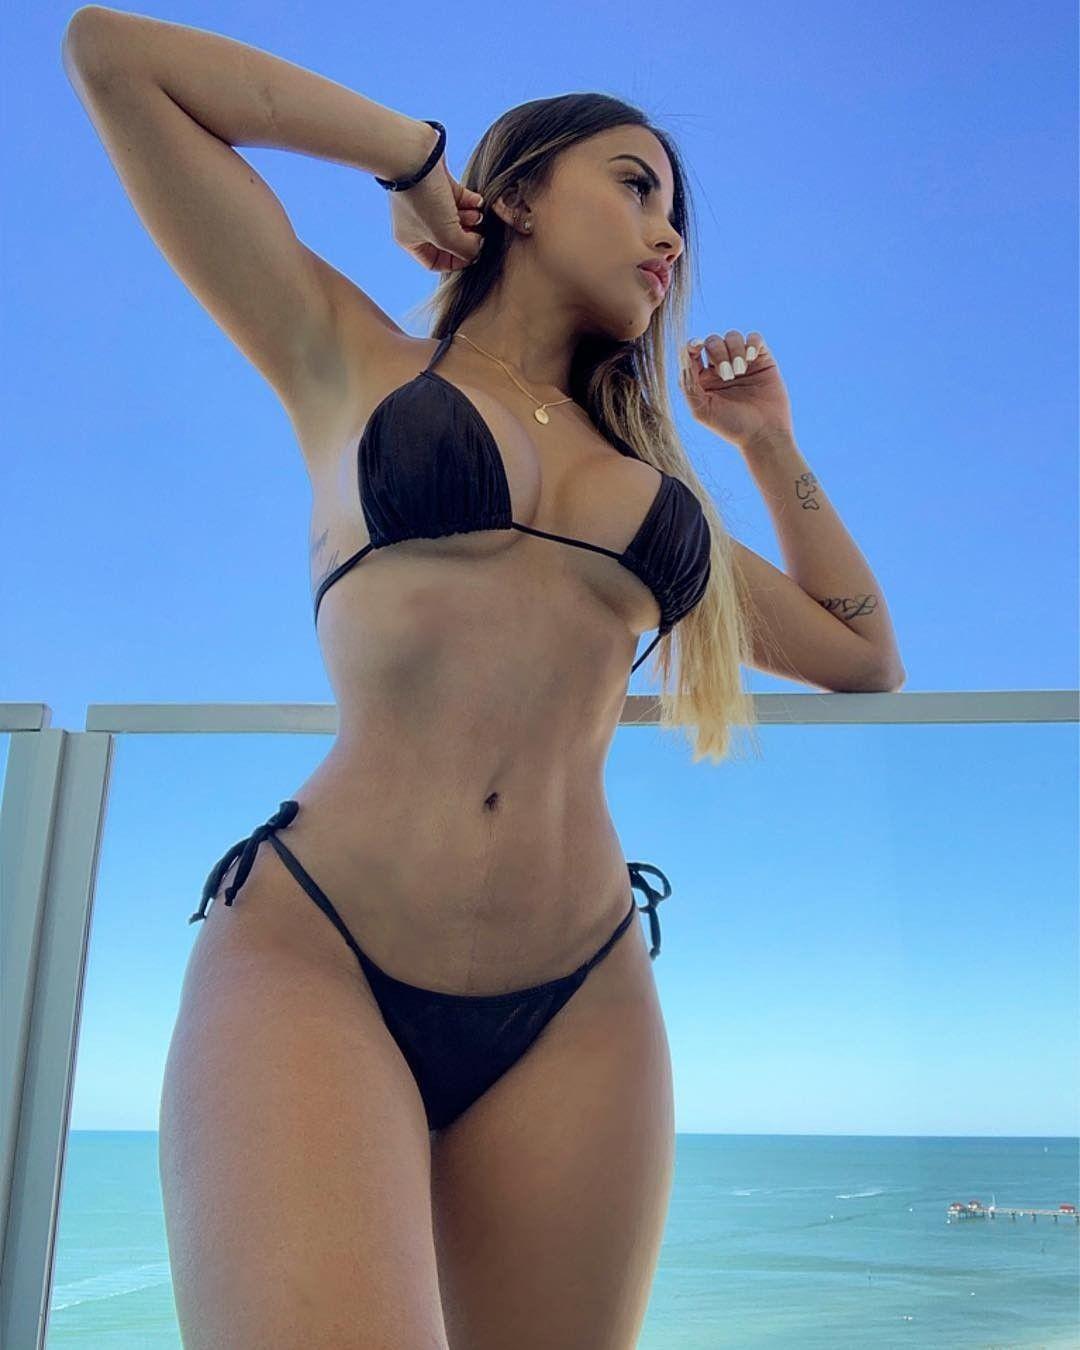 36db80f27160 Karina García | Bikini temptation en 2019 | Ser mujer, Mujeres y ...